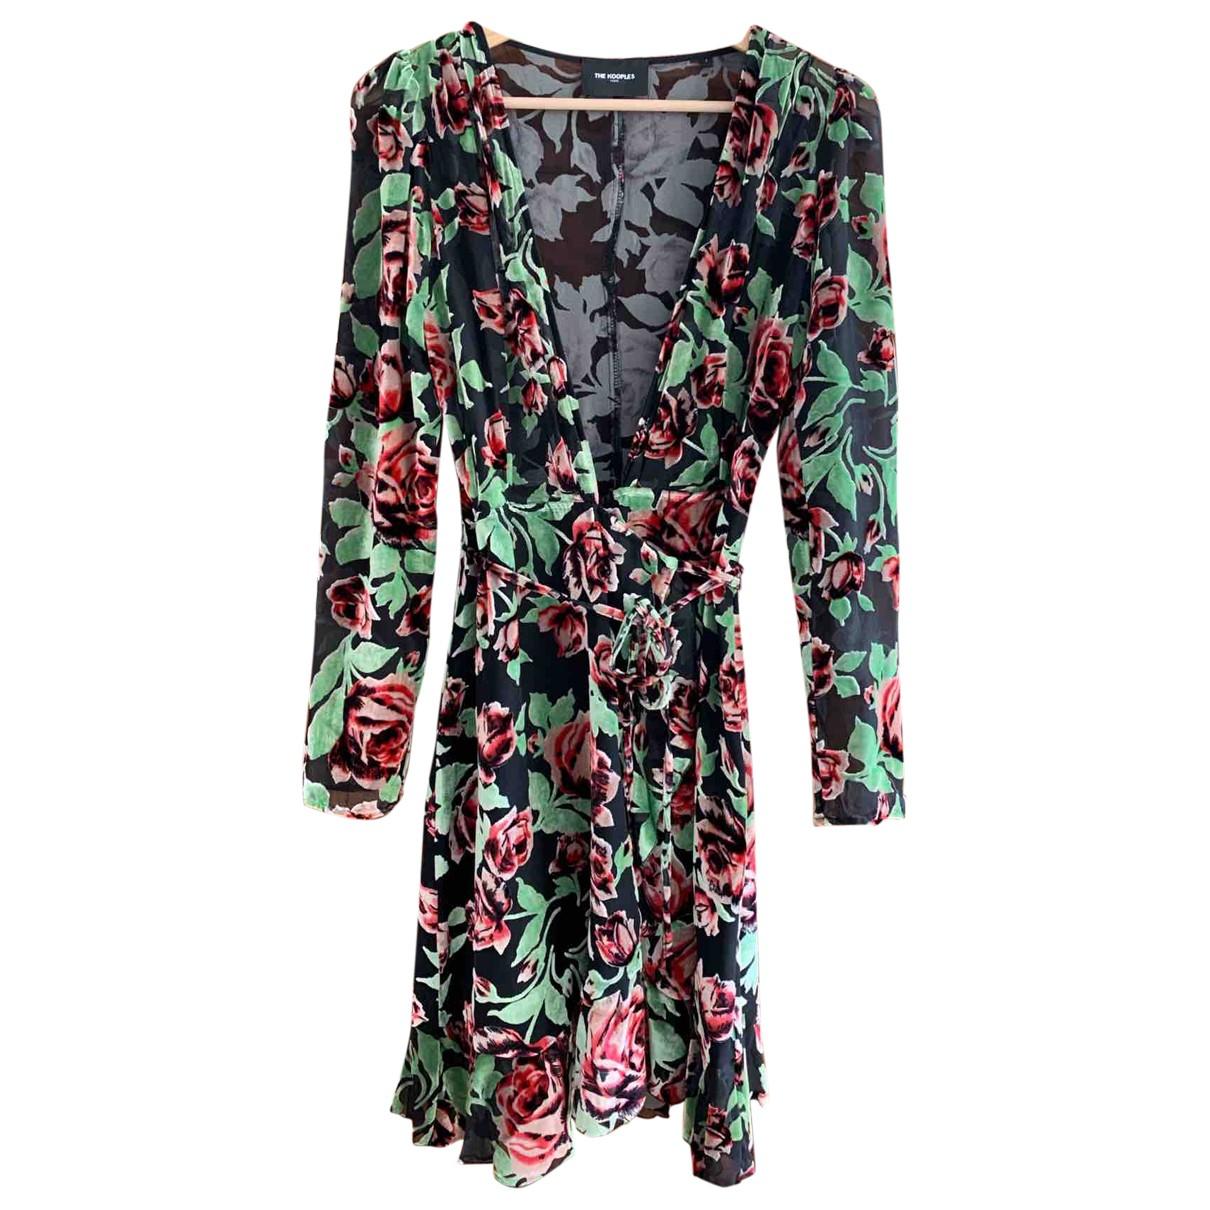 The Kooples \N Black dress for Women 1 US